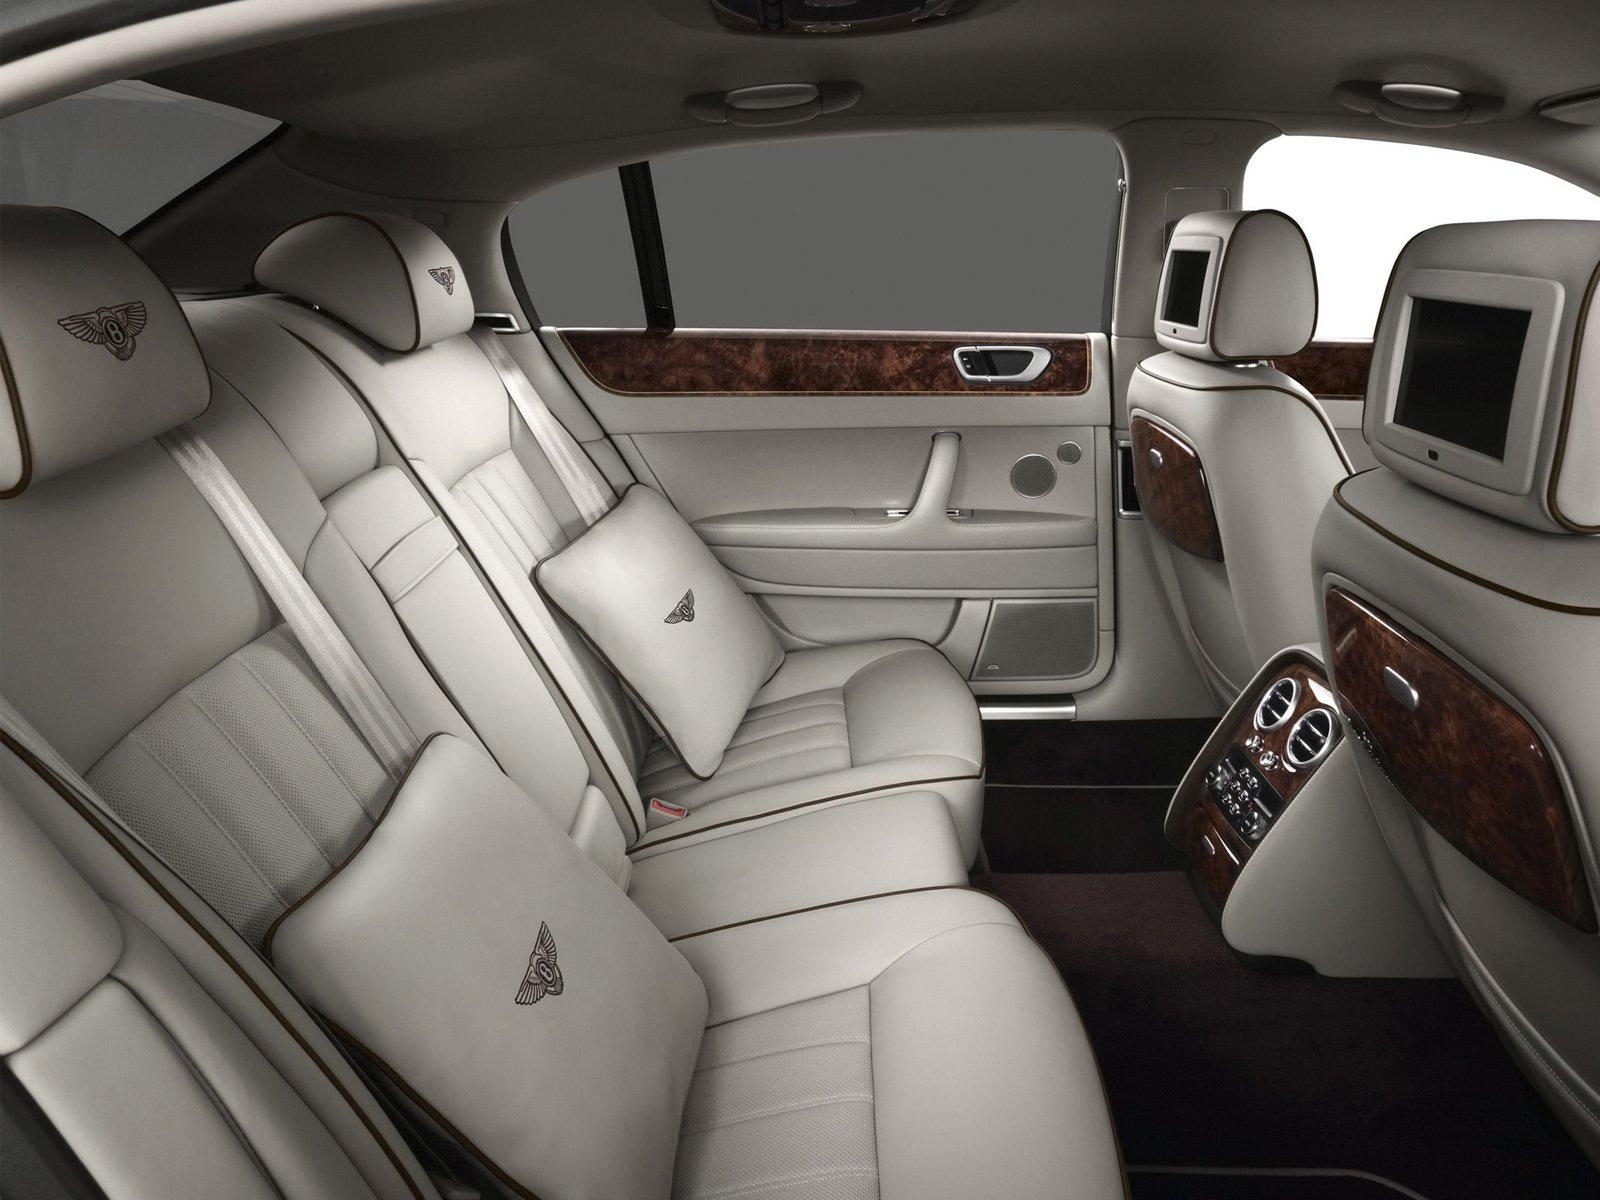 simply the best 4 door supercars - Porsche Panamera White Interior